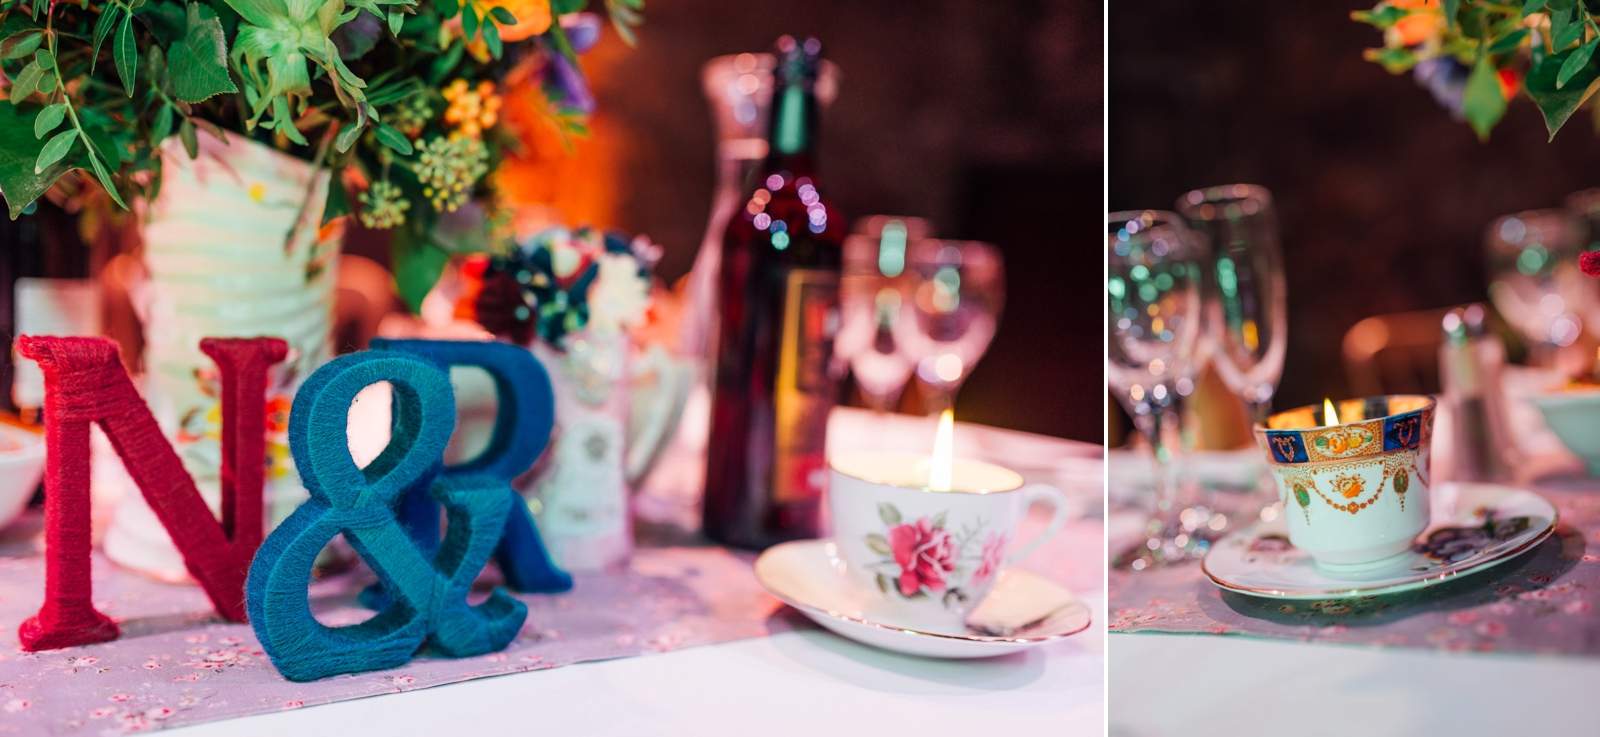 thecaves_retro_DIY_wedding_00084.jpg